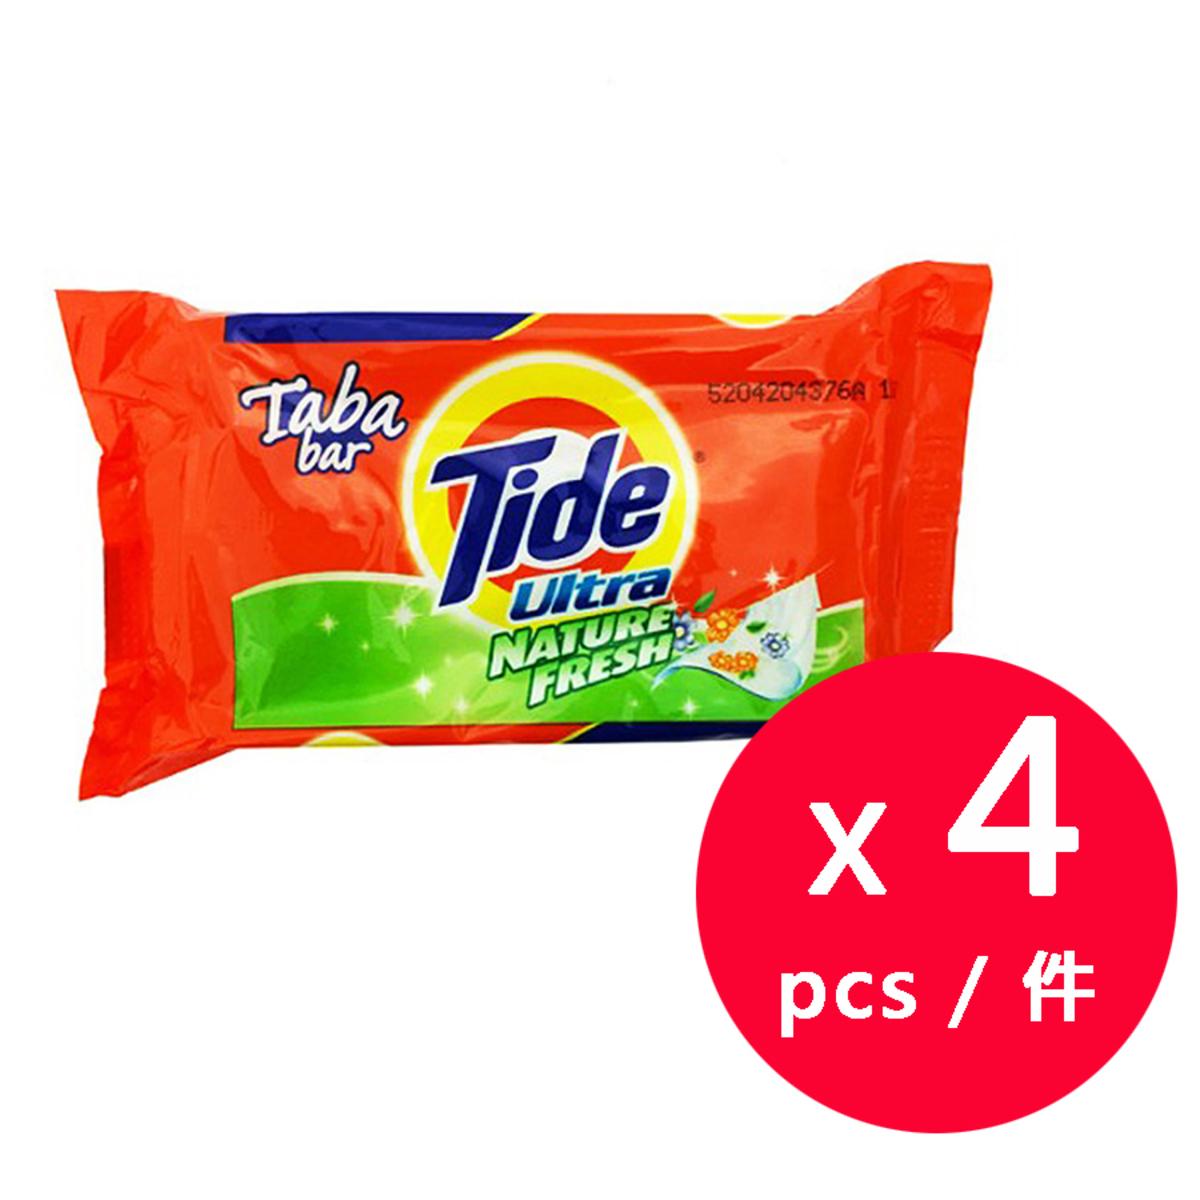 Tide加強除垢洗衣皂- 清香味 140克 x 4件 (平行進口)